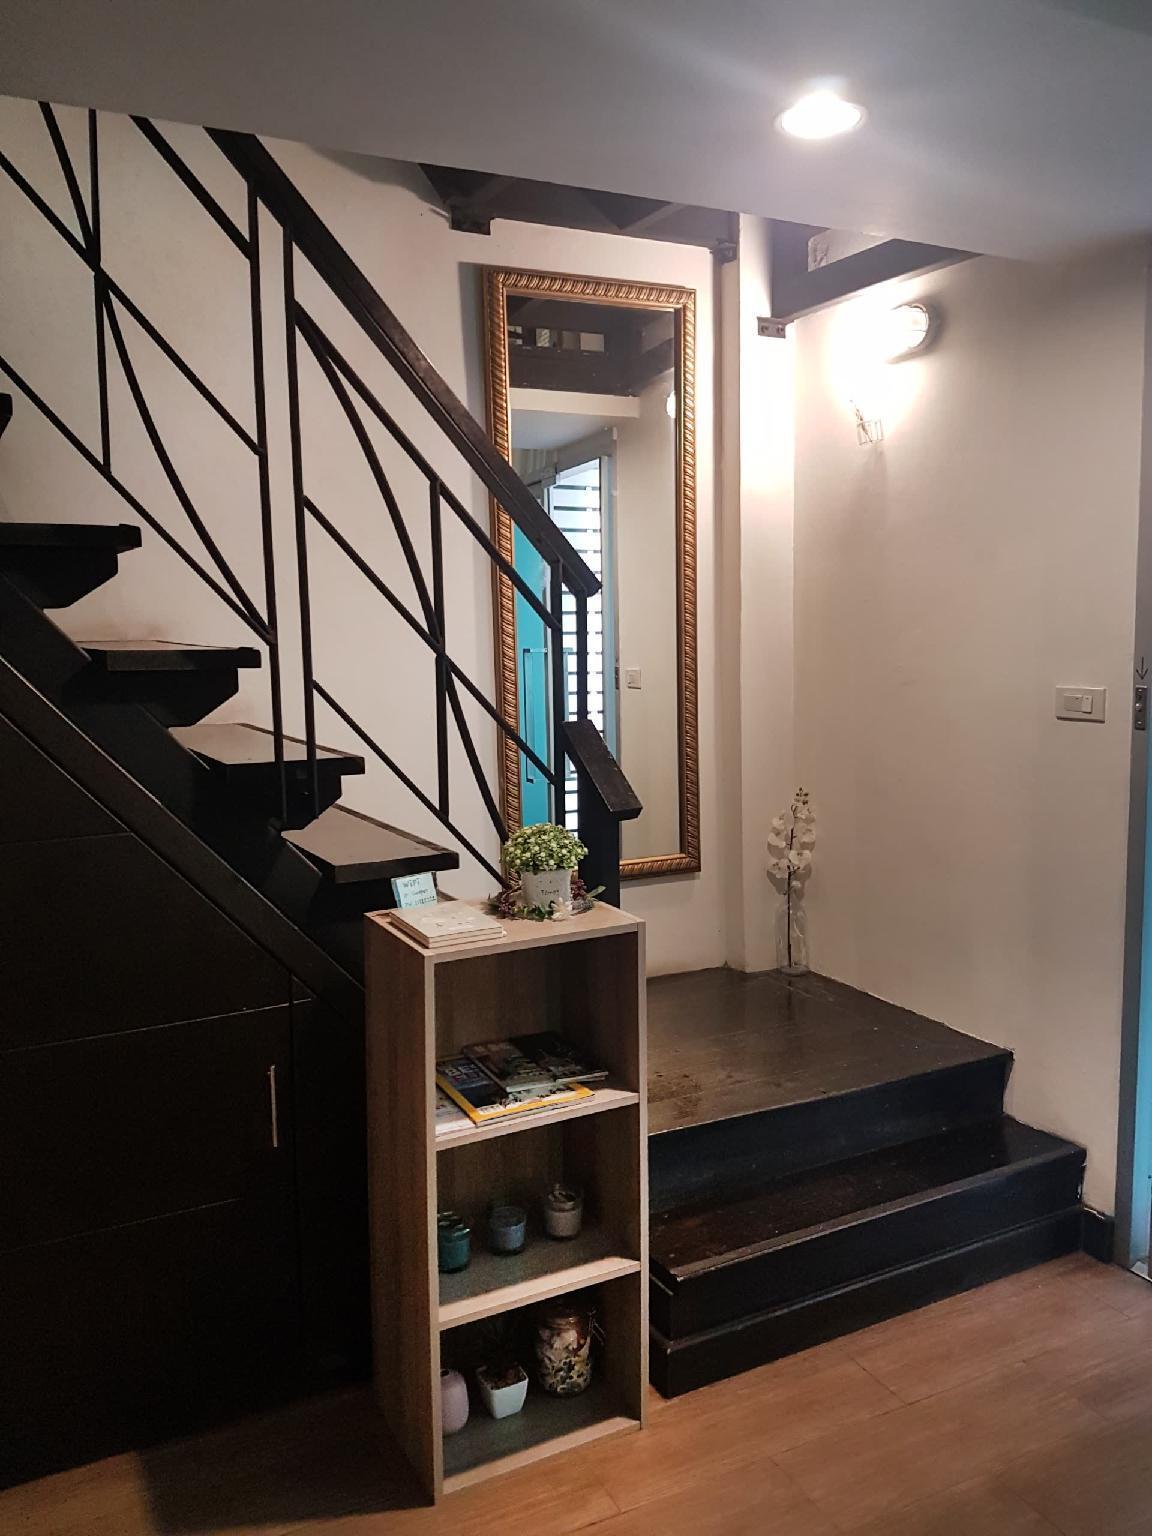 Explore Bangkok City-200m BTS-Siam Sq-MBK-GPalace สตูดิโอ อพาร์ตเมนต์ 1 ห้องน้ำส่วนตัว ขนาด 23 ตร.ม. – สยาม